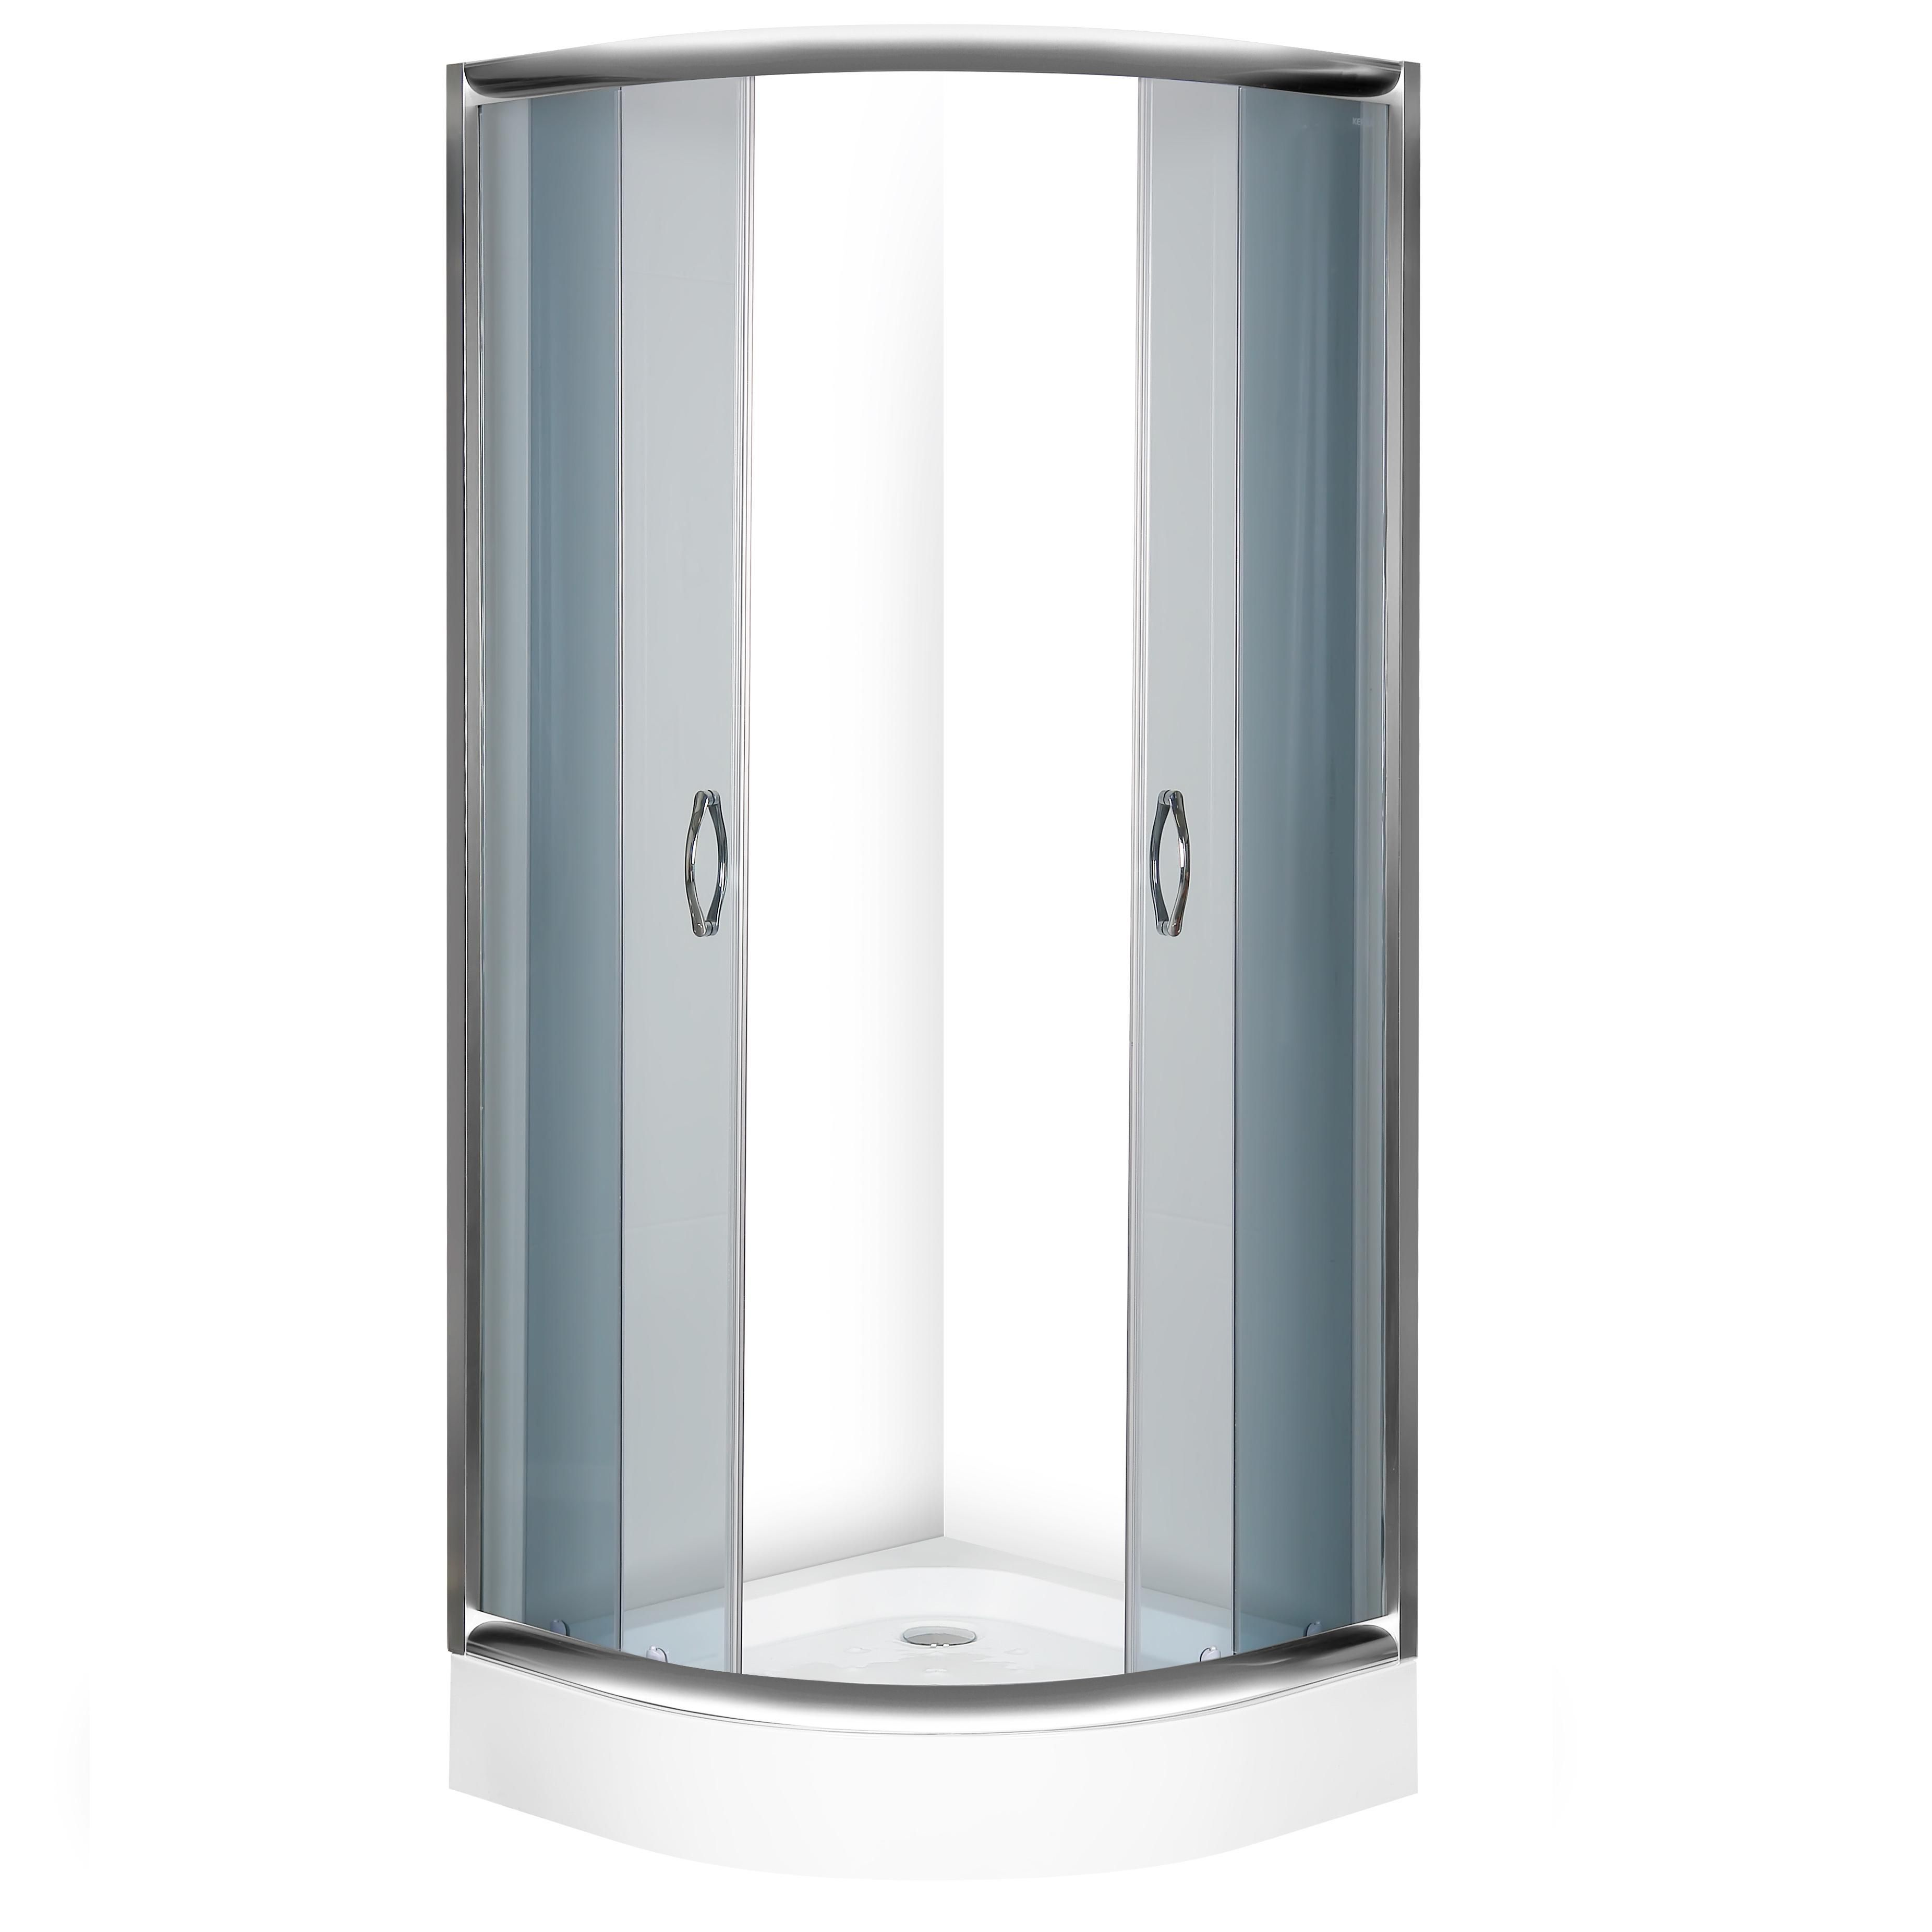 Kerra Elsa douchecabine grijsglas kwartrond 80x80cm inclusief douchebak